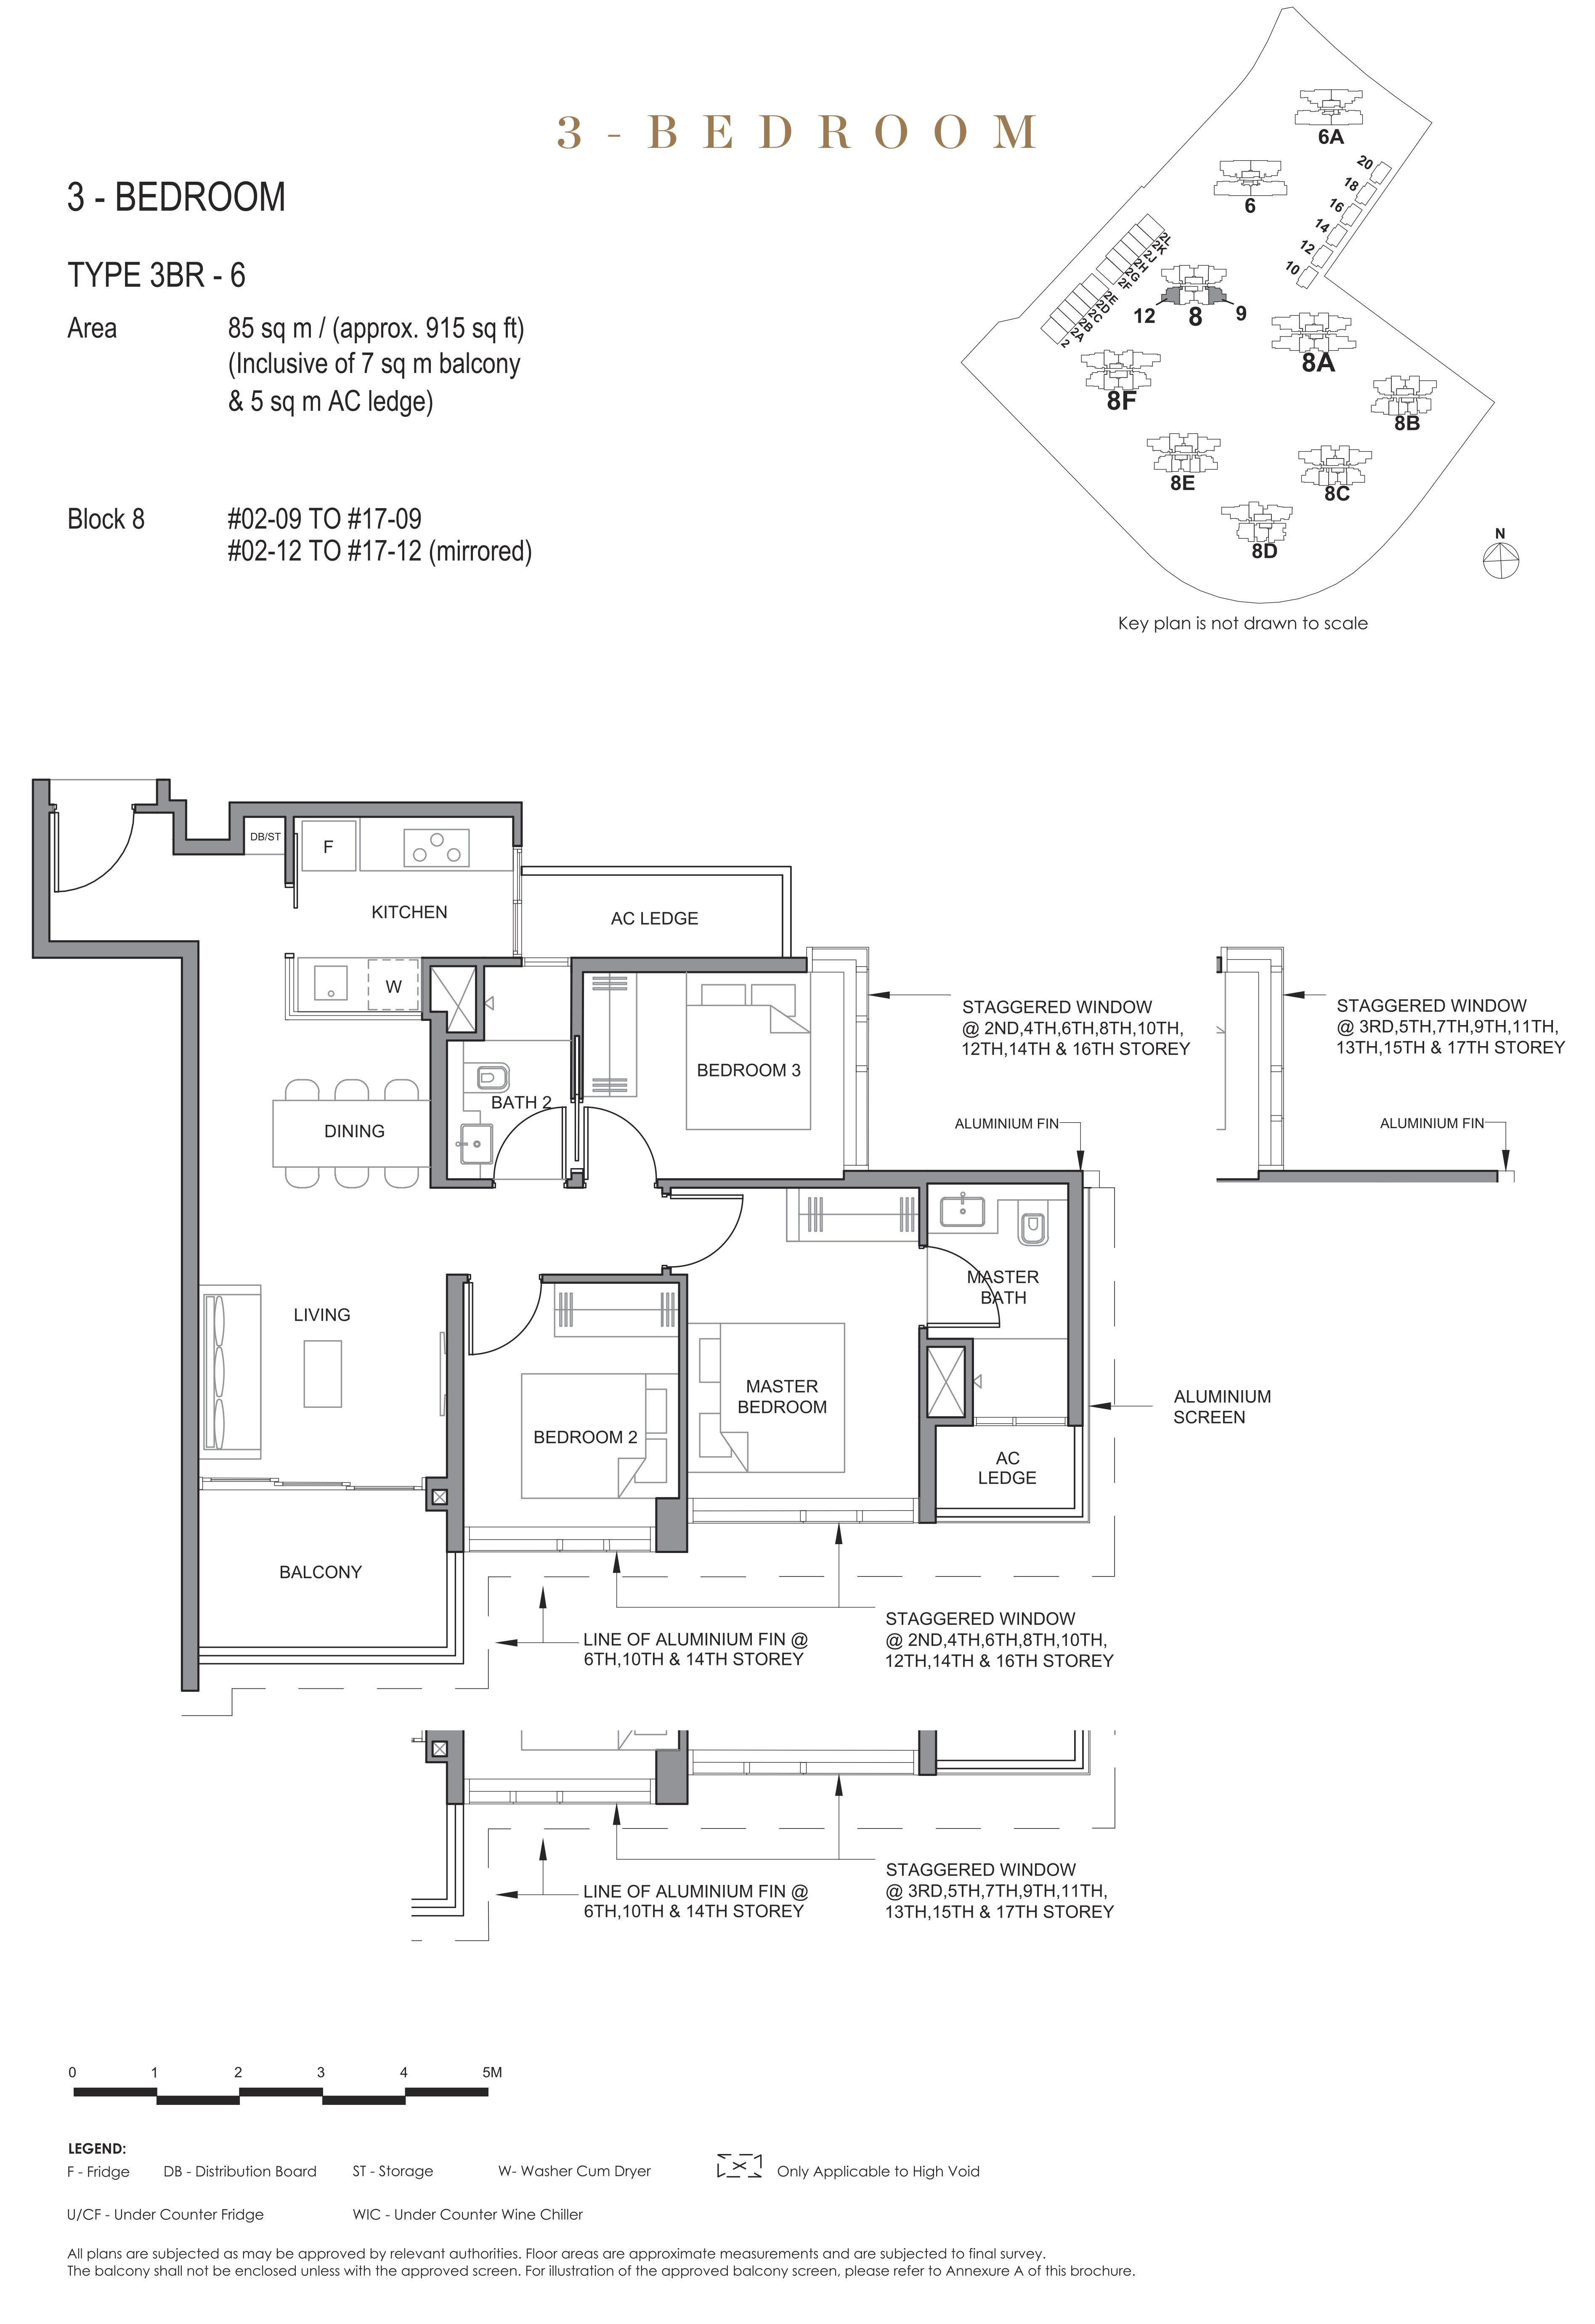 Parc Clematis 锦泰门第 elegance 3 bedroom 3卧房 3BR-6